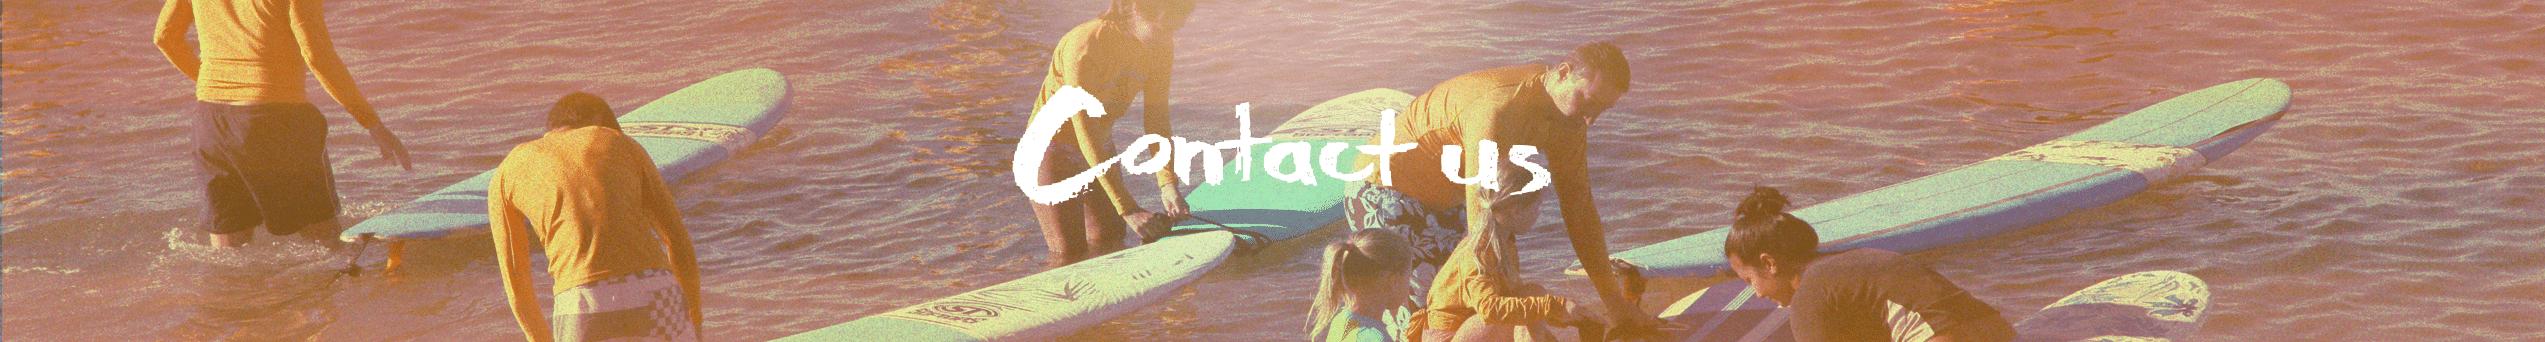 header-contact